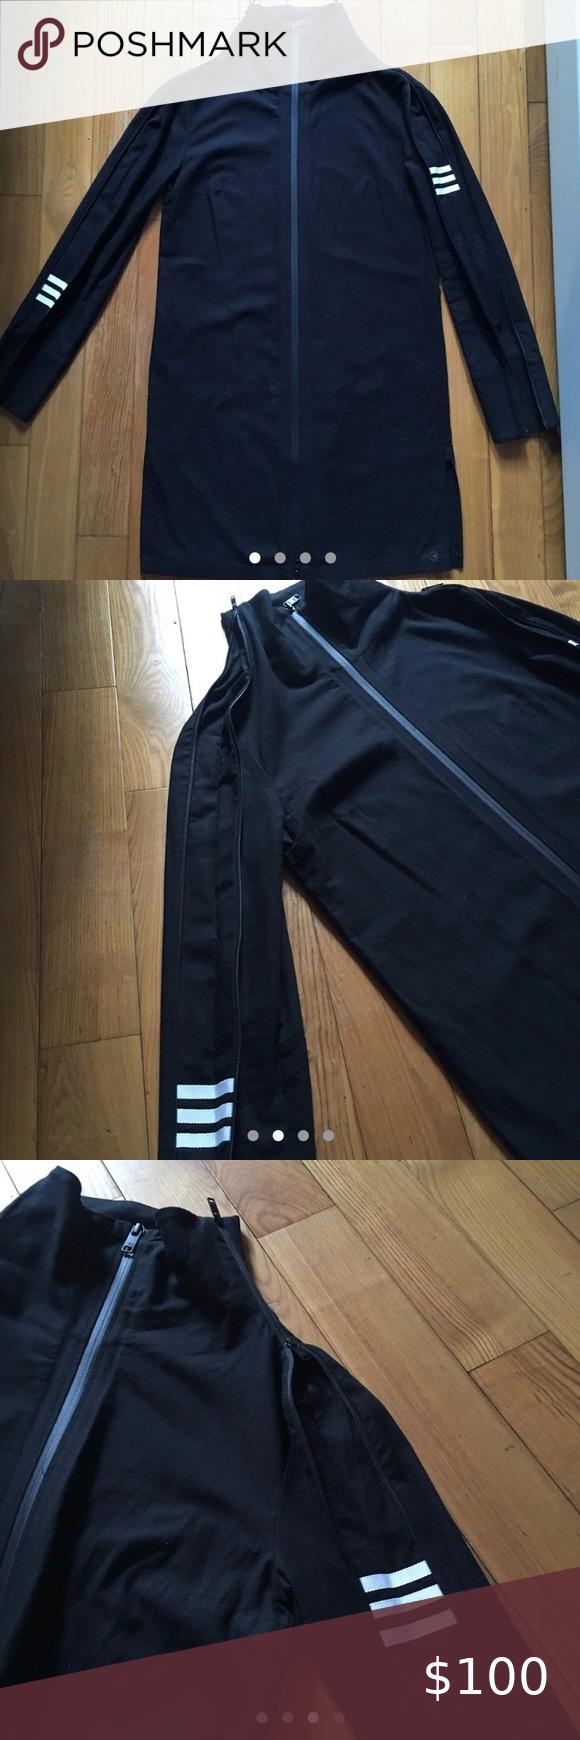 Y3 Yohji Yamamoto Shirt Jacket Shirt Jacket Long Shirt Adidas Y3 Yohji Yamamoto